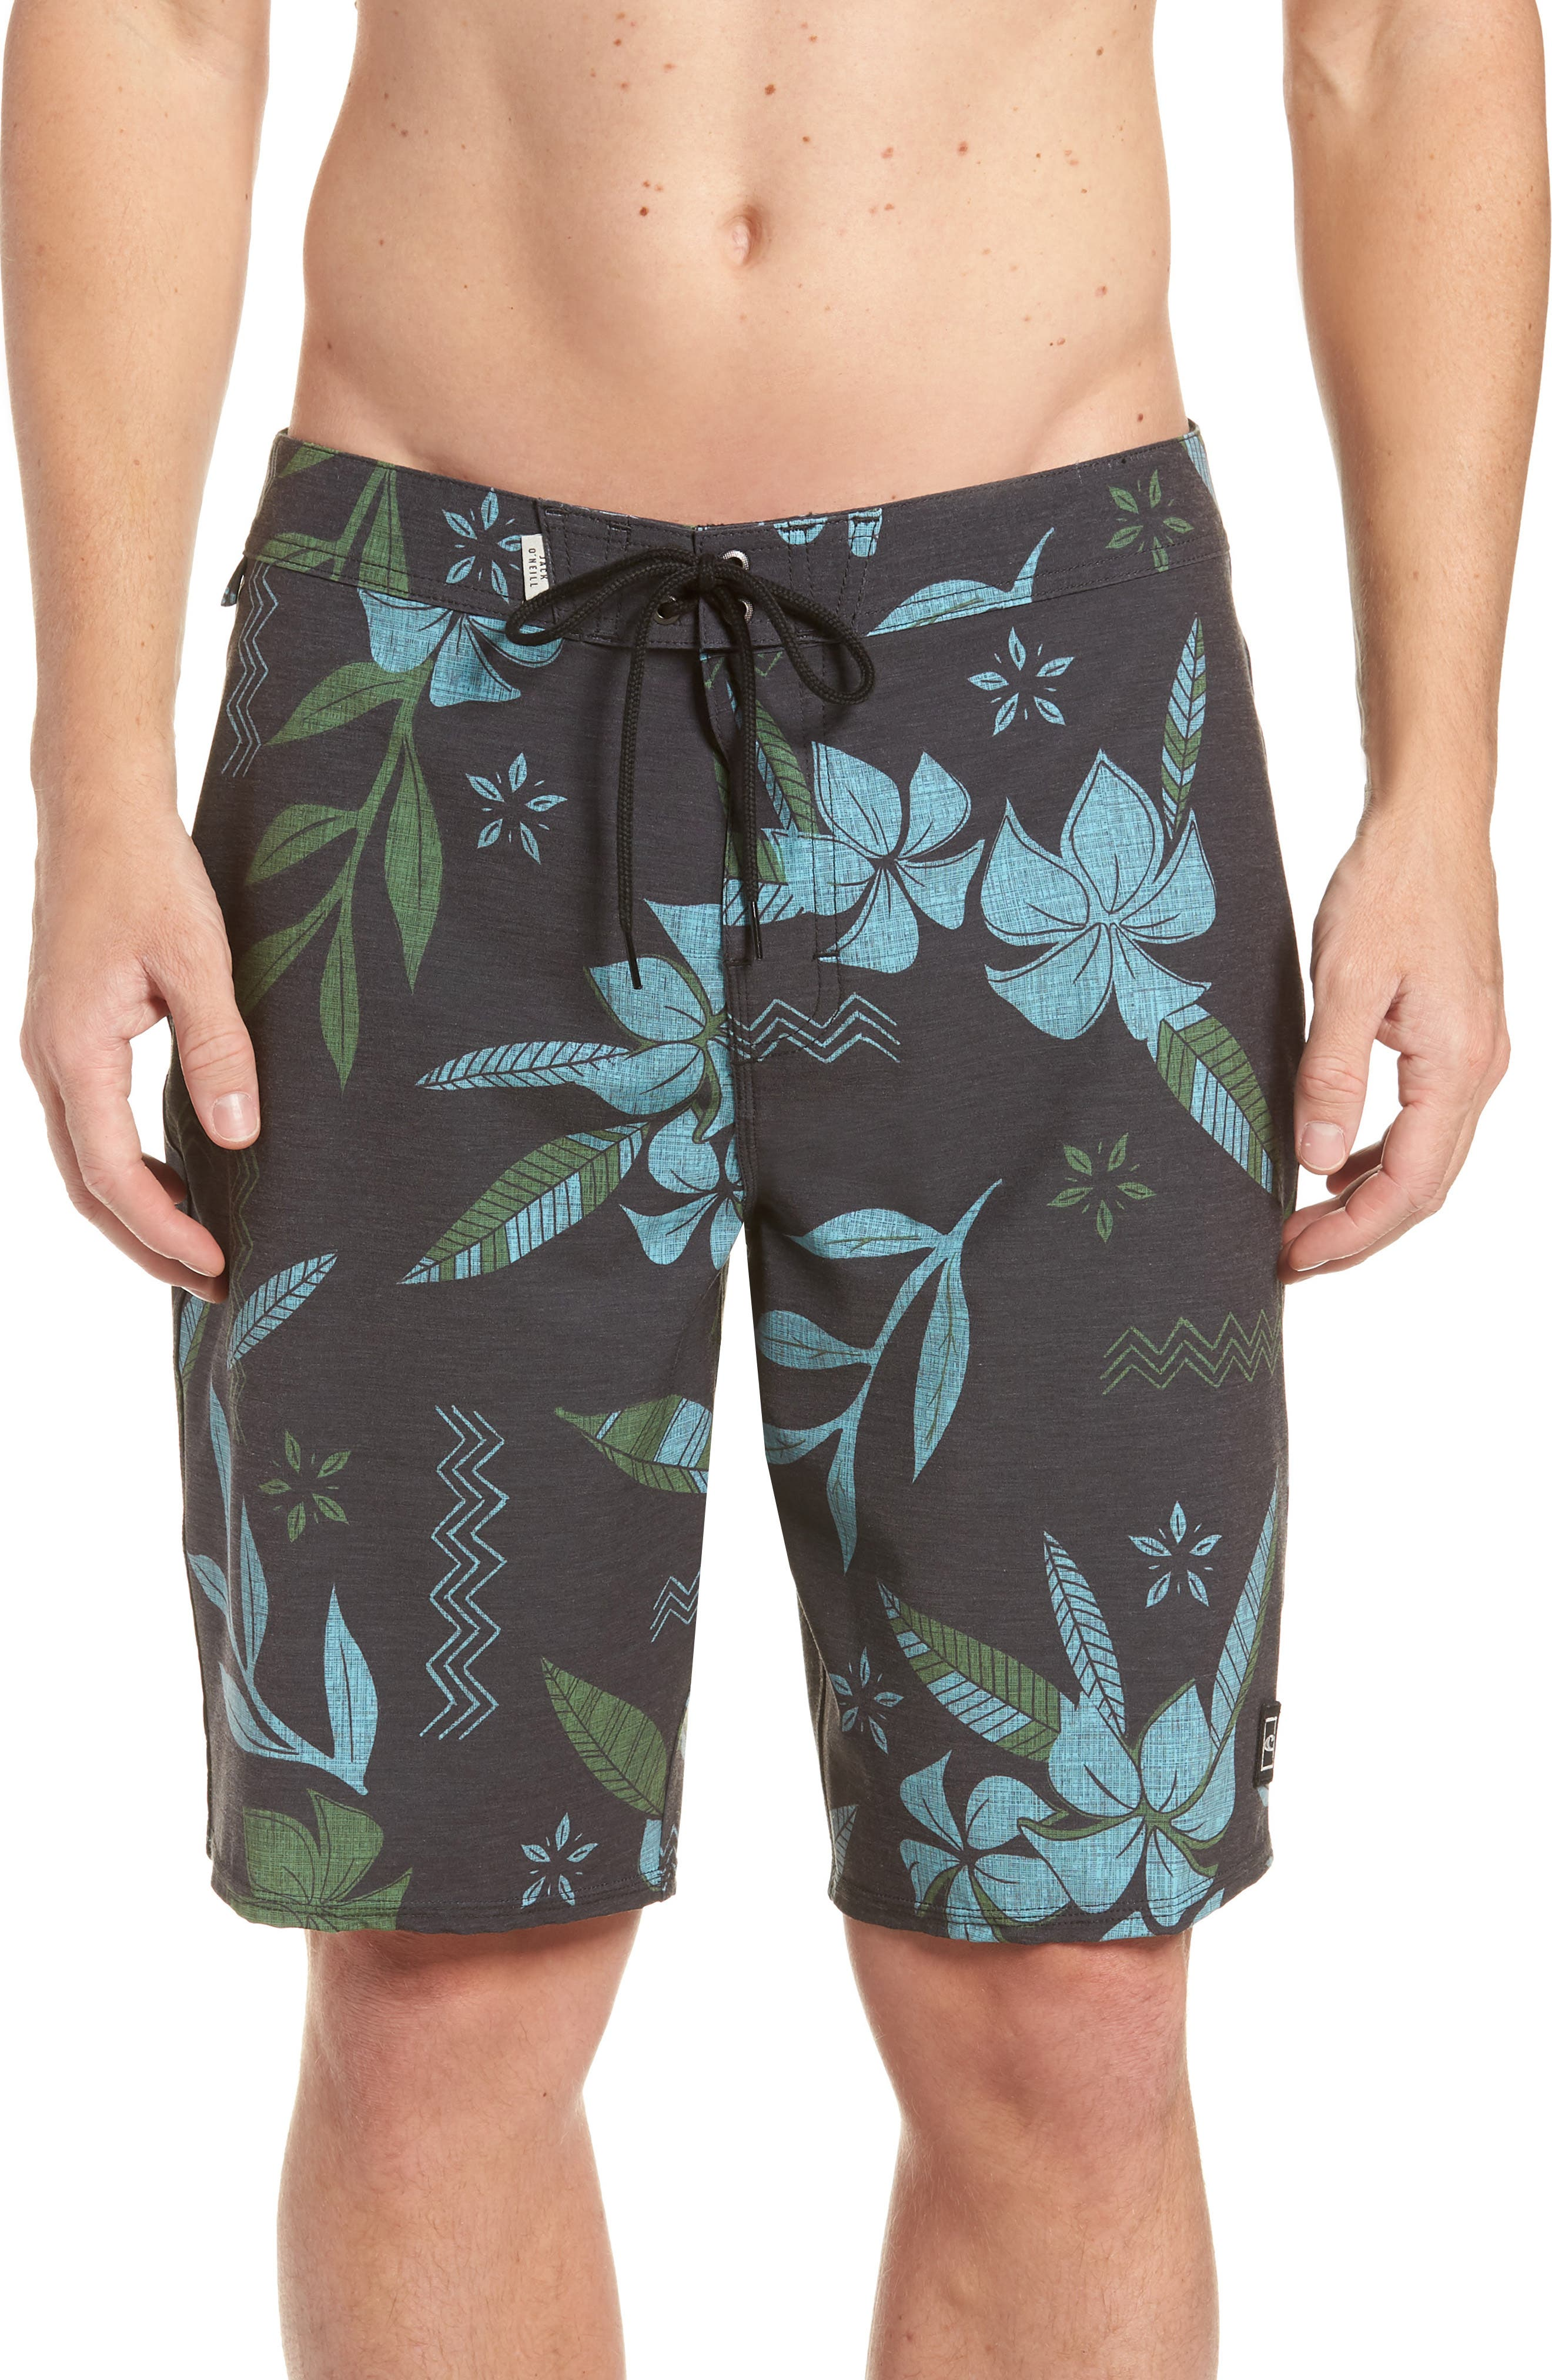 Maui Board Shorts,                             Main thumbnail 1, color,                             Black